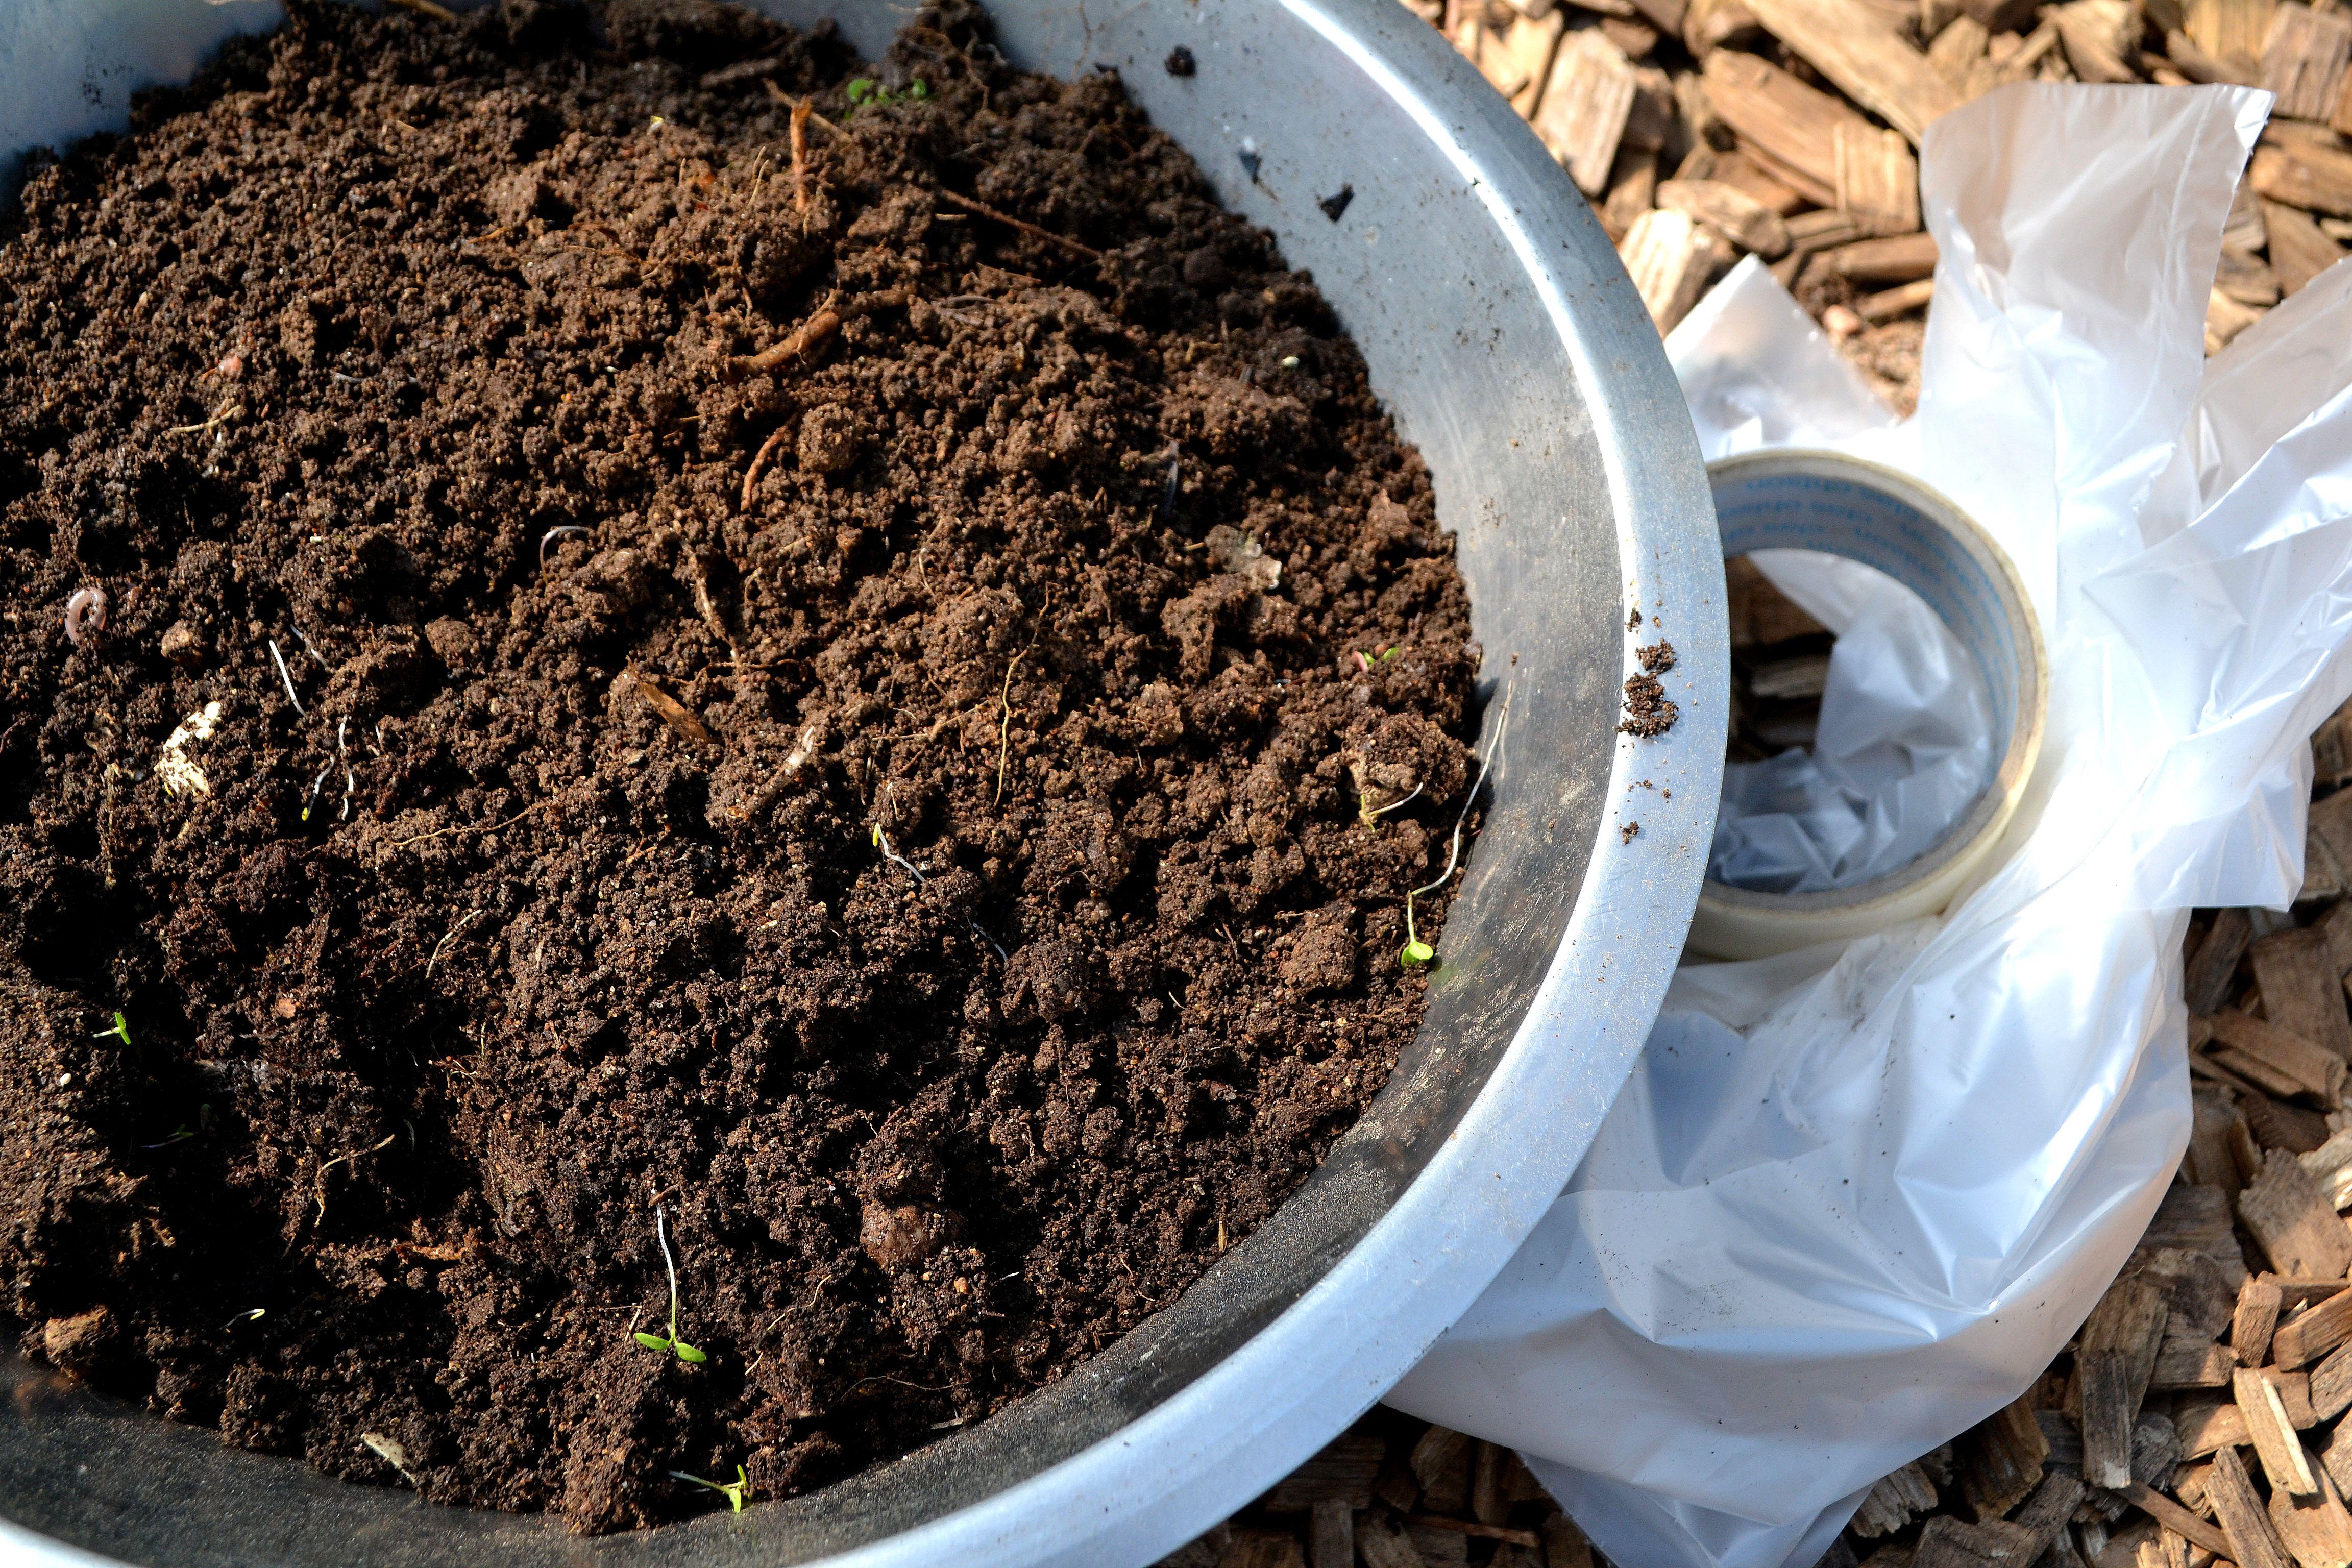 En rostfri skål fylld med jord. Soil analysis, a bowl filled with soil.